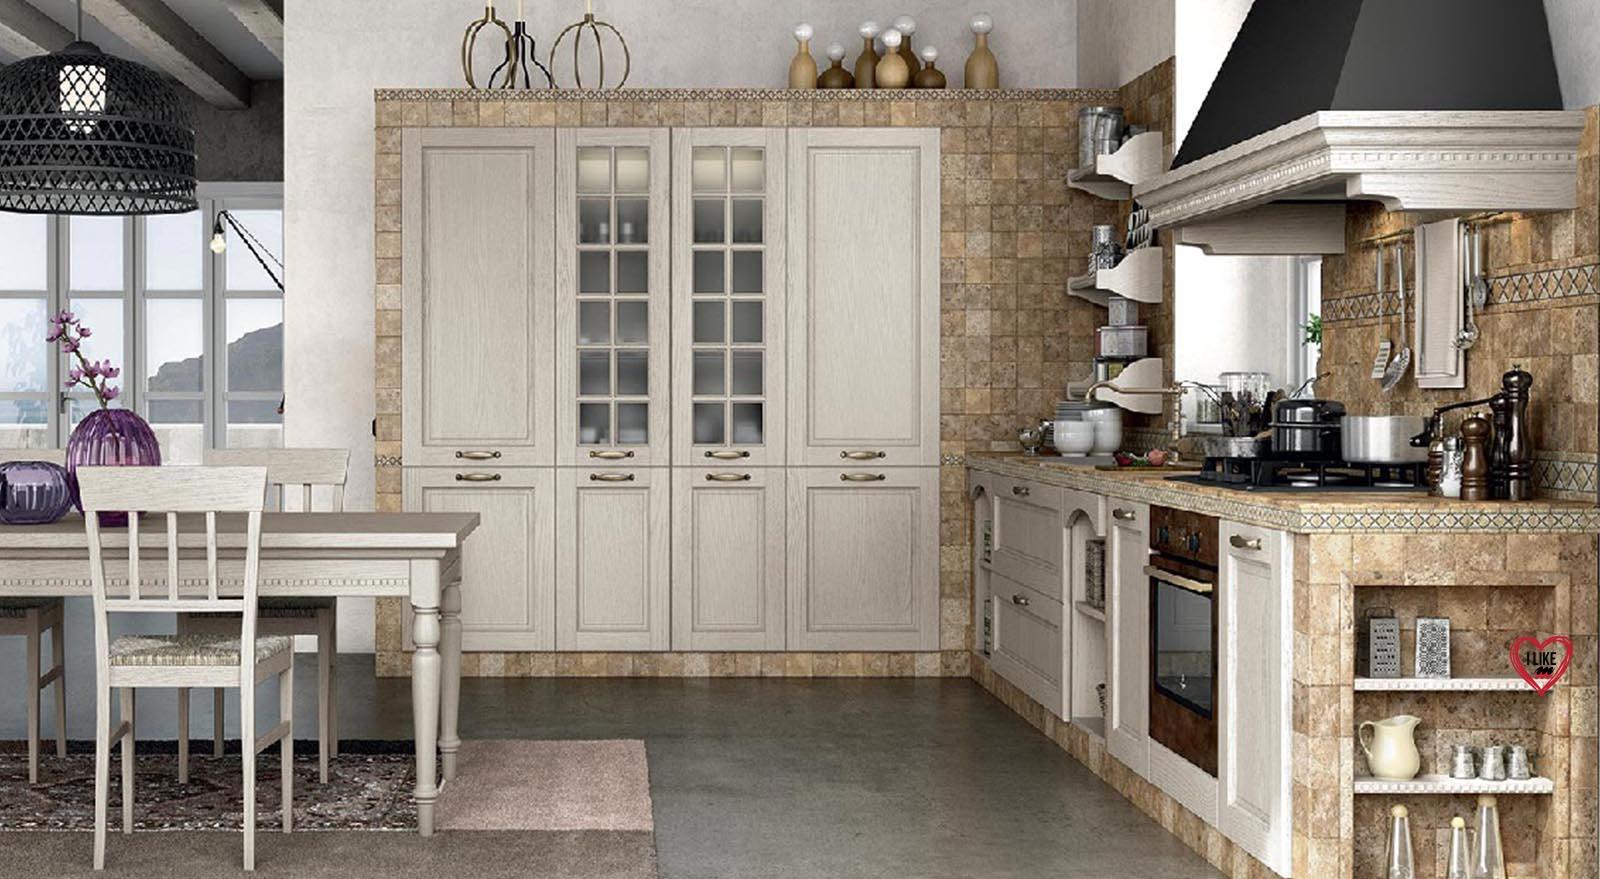 Vendita di cucine classiche in muratura a padova marchio lube - Cucine in muratura lube ...